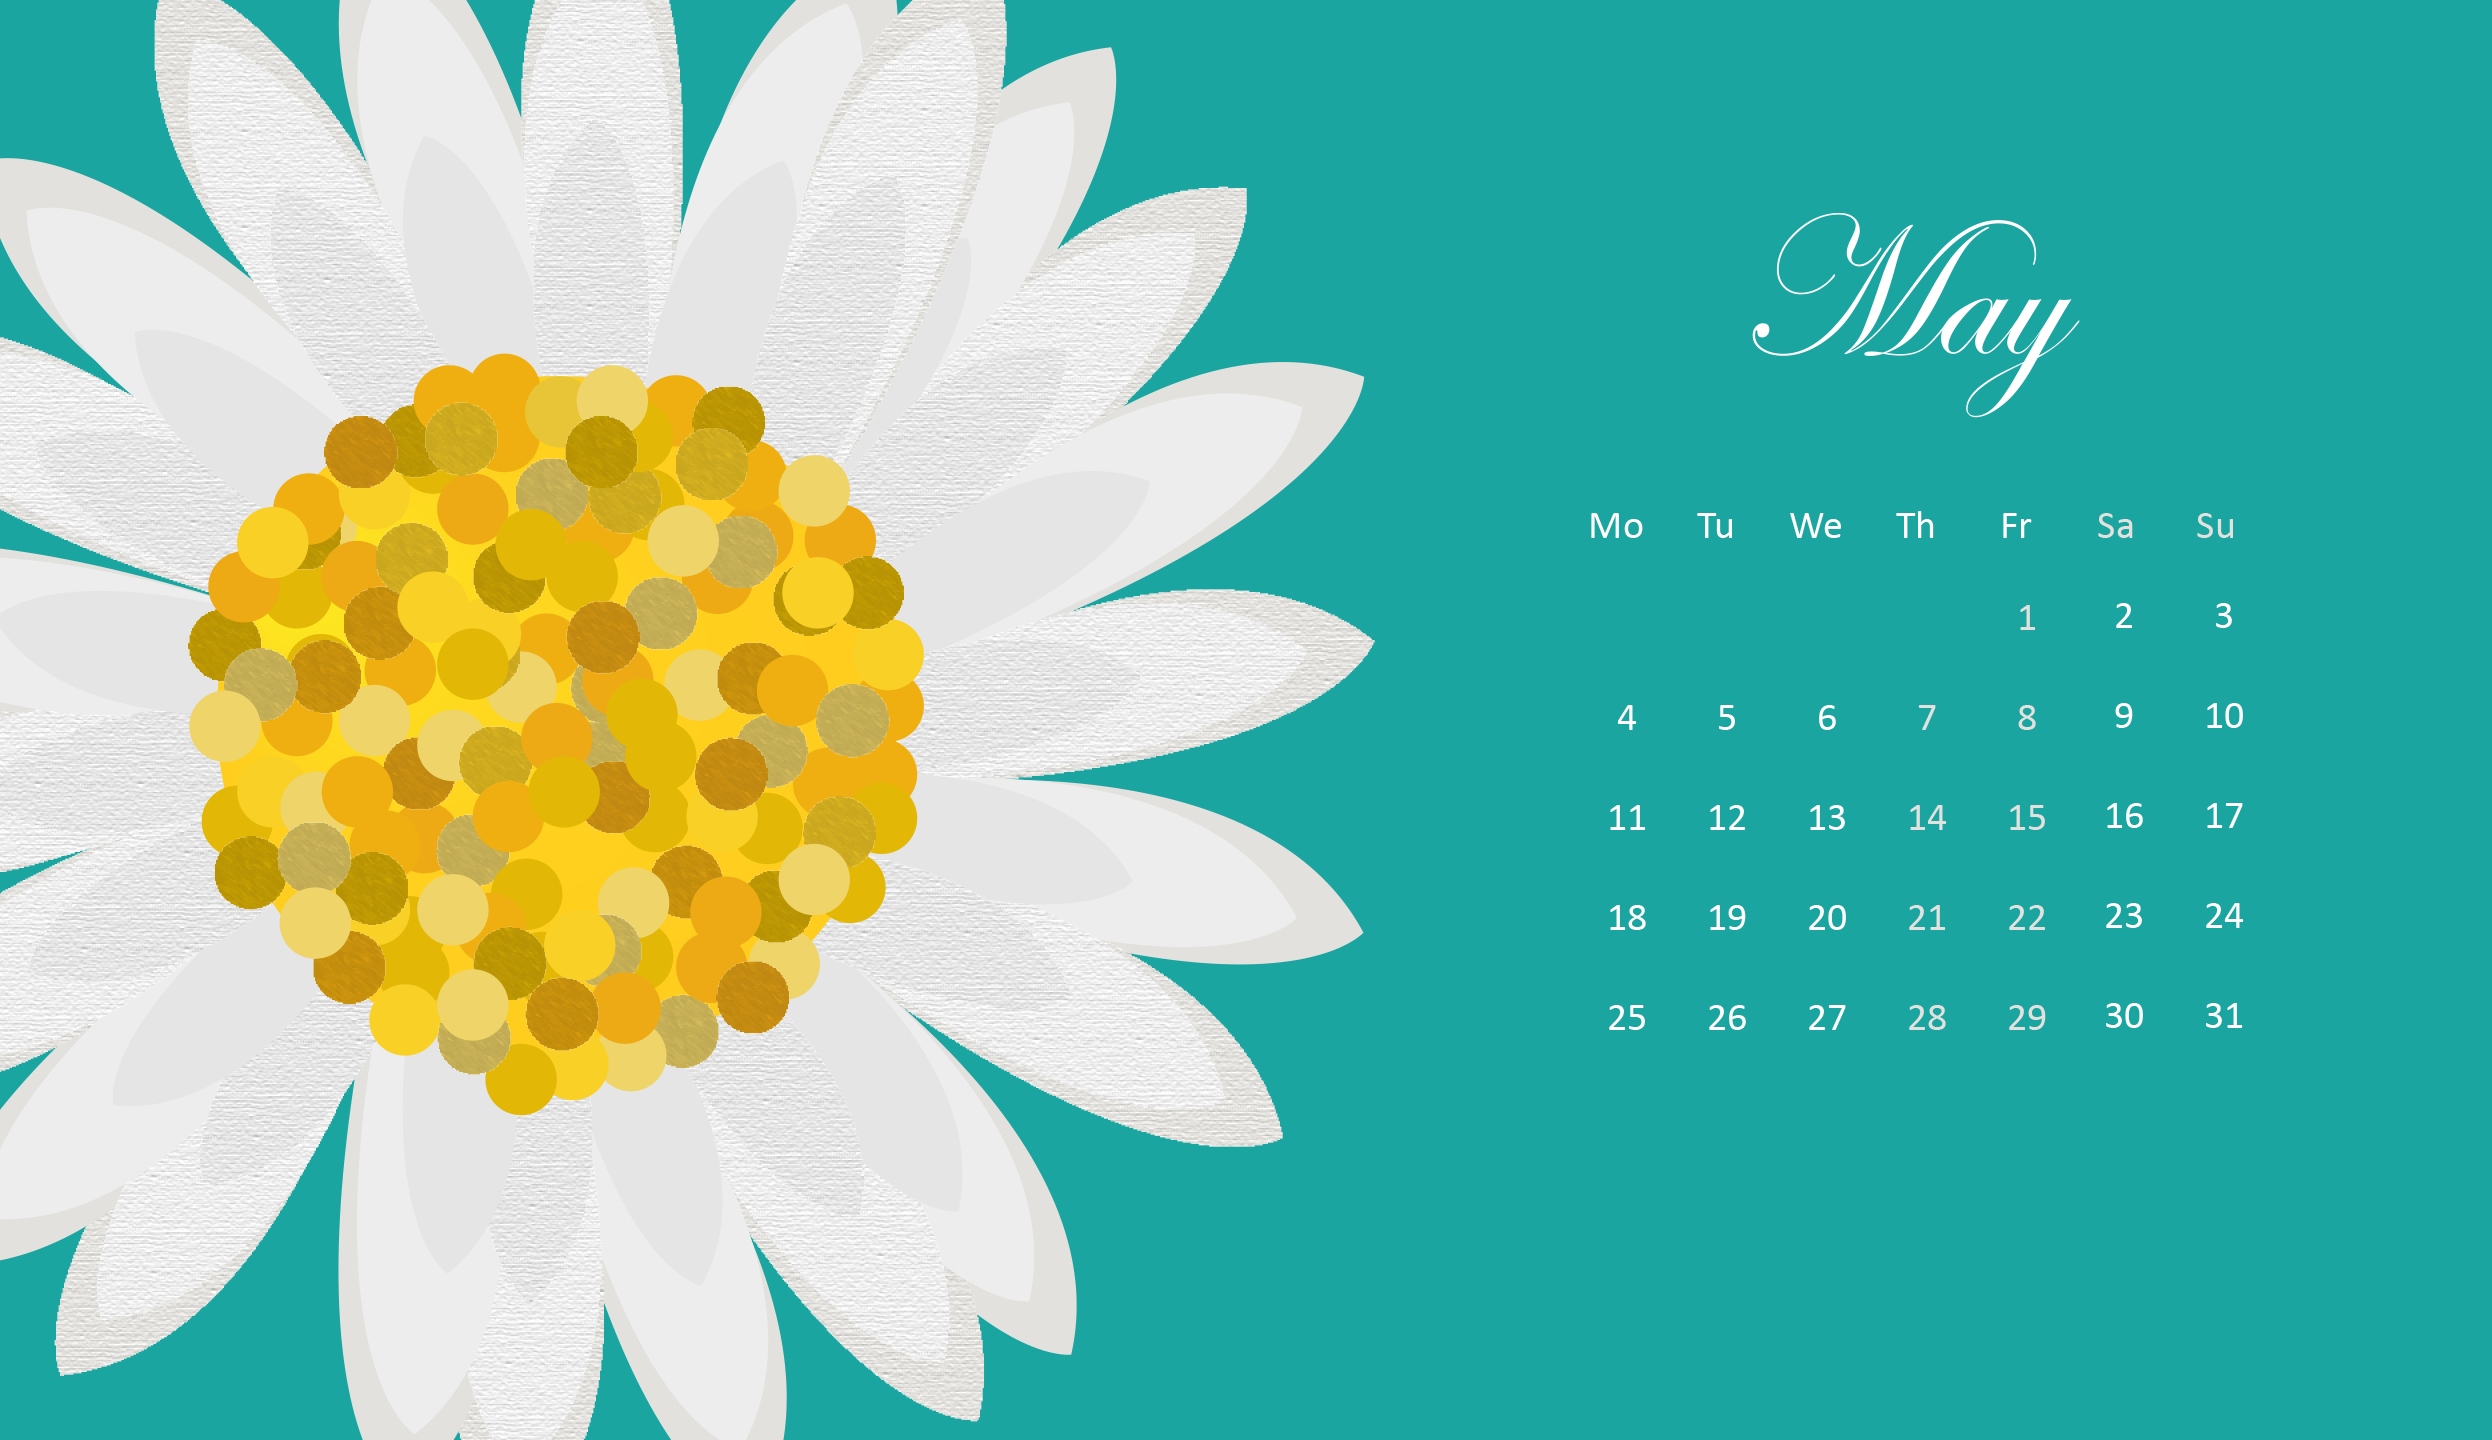 May 2020 Desktop Wallpapers - Wallpaper ...